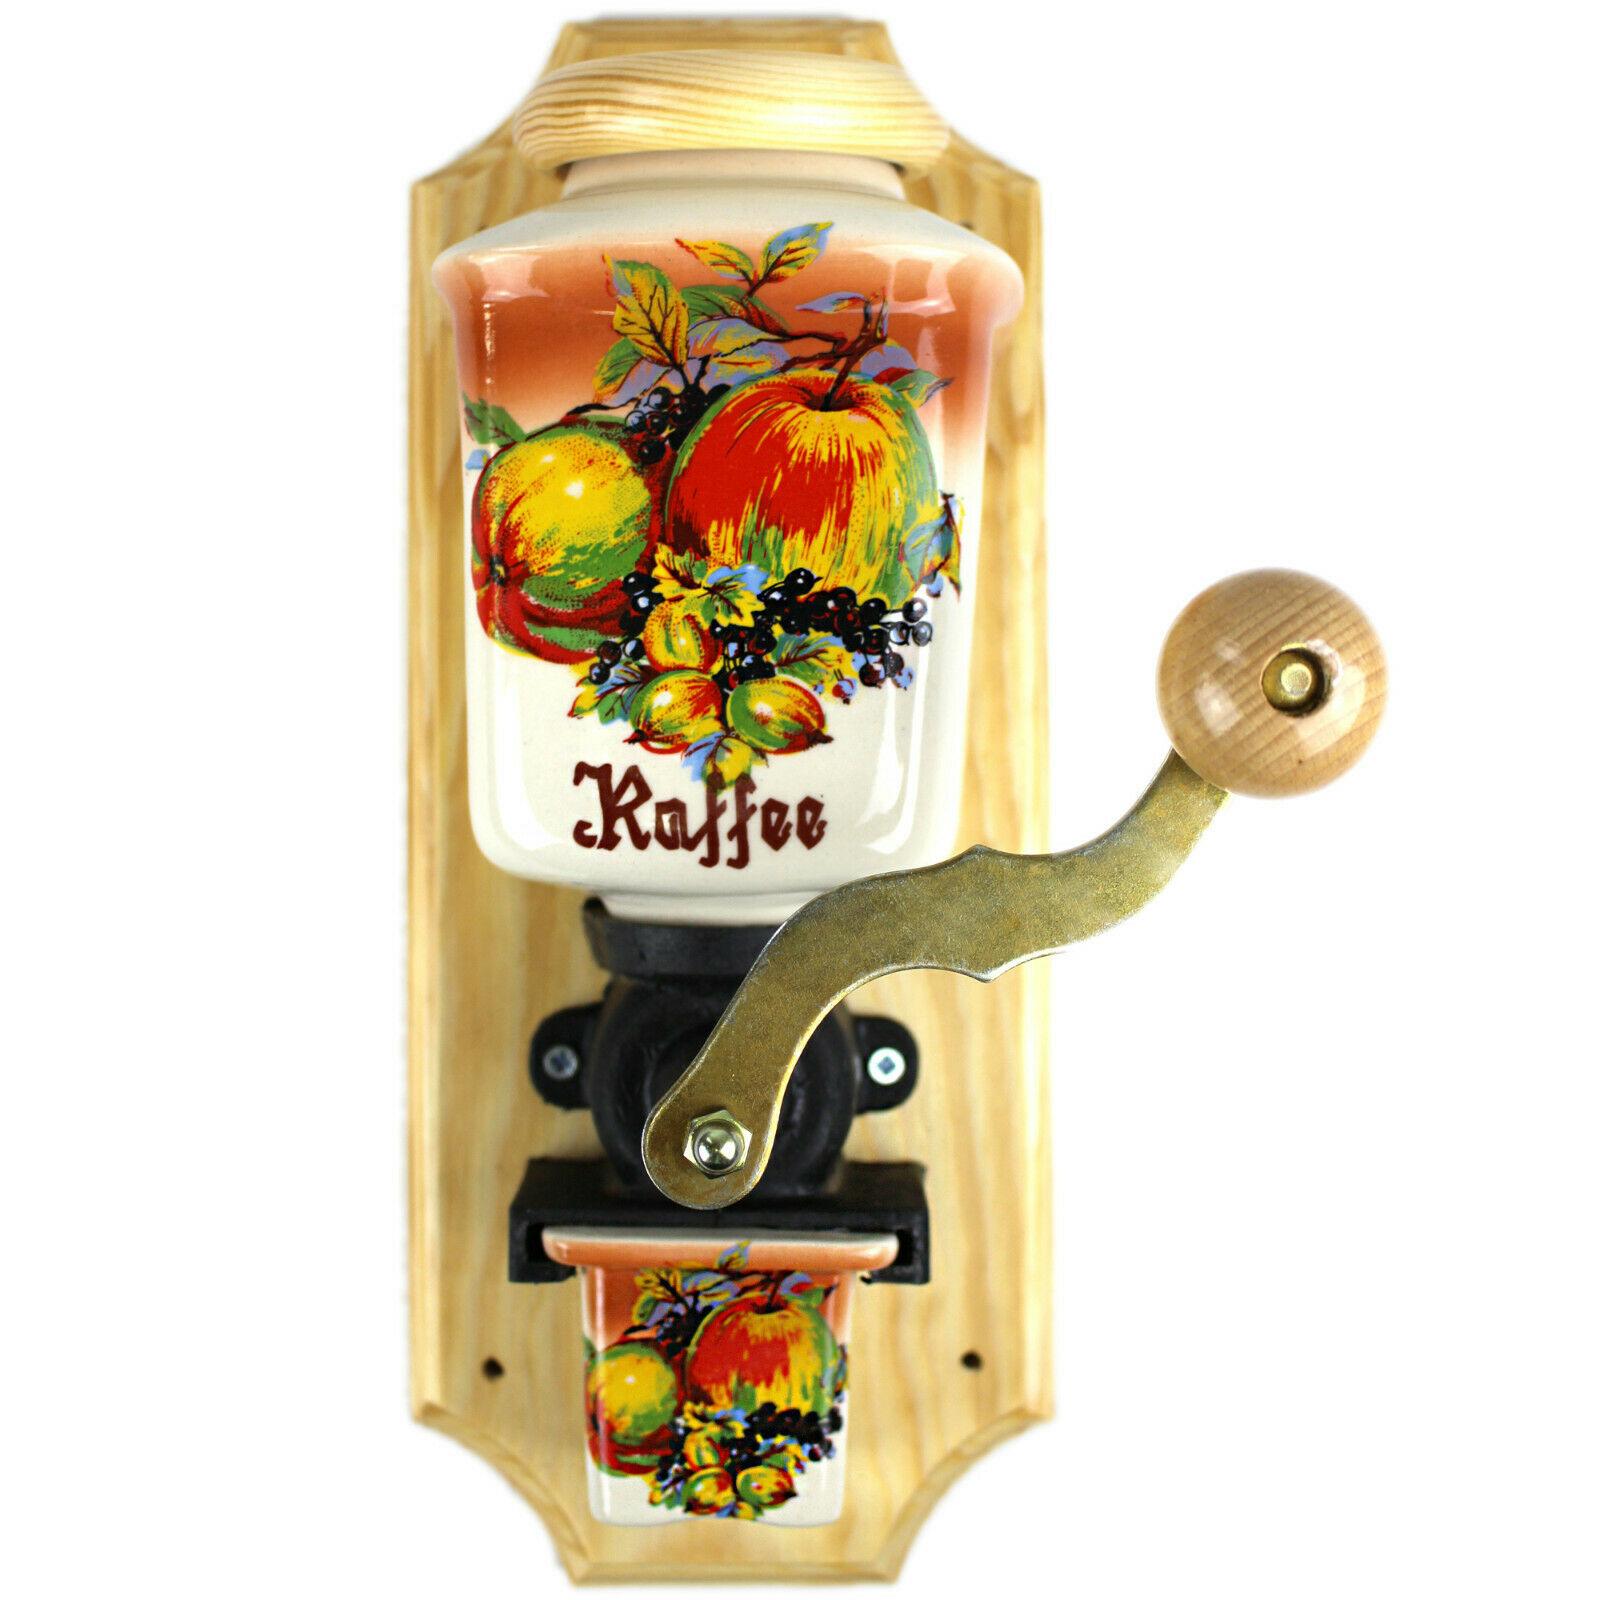 Full Size of Obst Aufbewahrung Wand Kaffeemhle Keramik Deko Wandkaffeemhle Wandmhle Glastrennwand Dusche Wandbelag Küche Wandregal Bad Anbauwand Wohnzimmer Wandtattoos Wohnzimmer Obst Aufbewahrung Wand